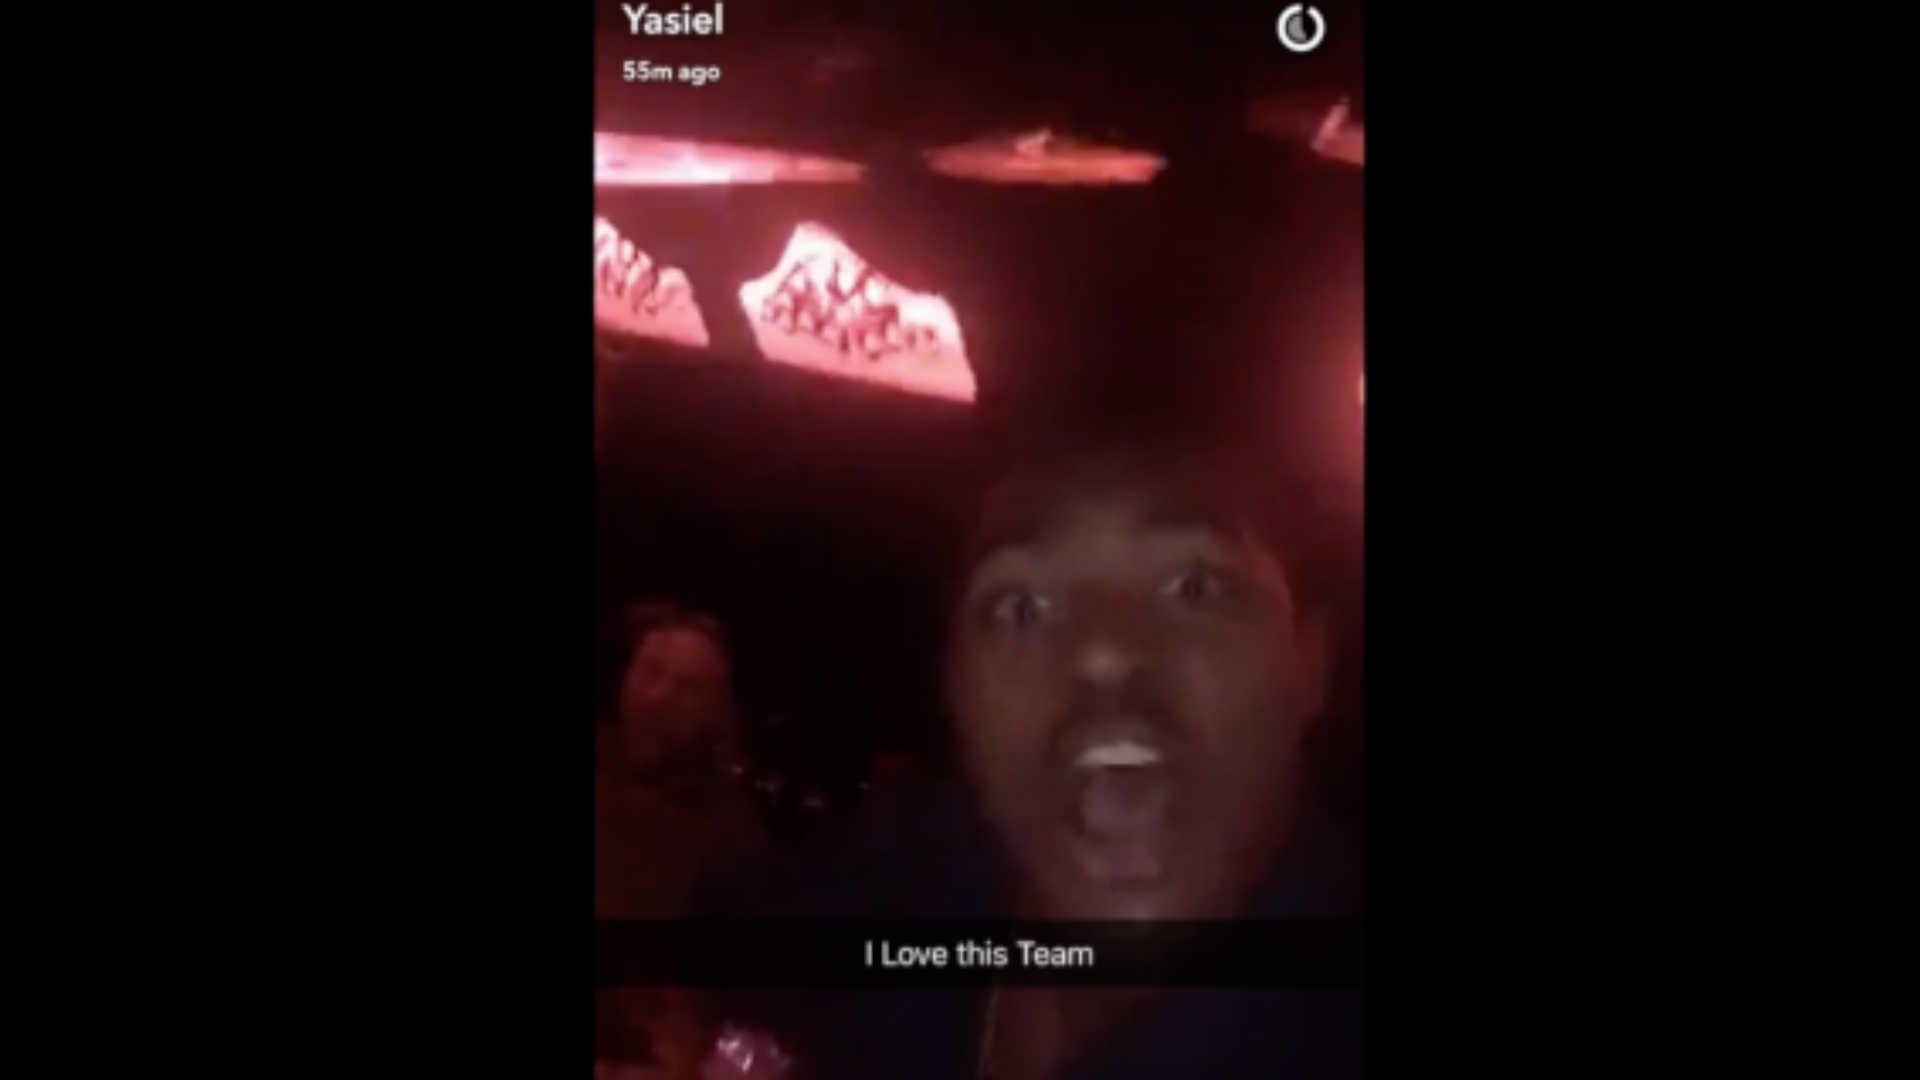 Yasiel-puig-on-snapchat_107rud0qwsftt1bd1mqu6tch6f